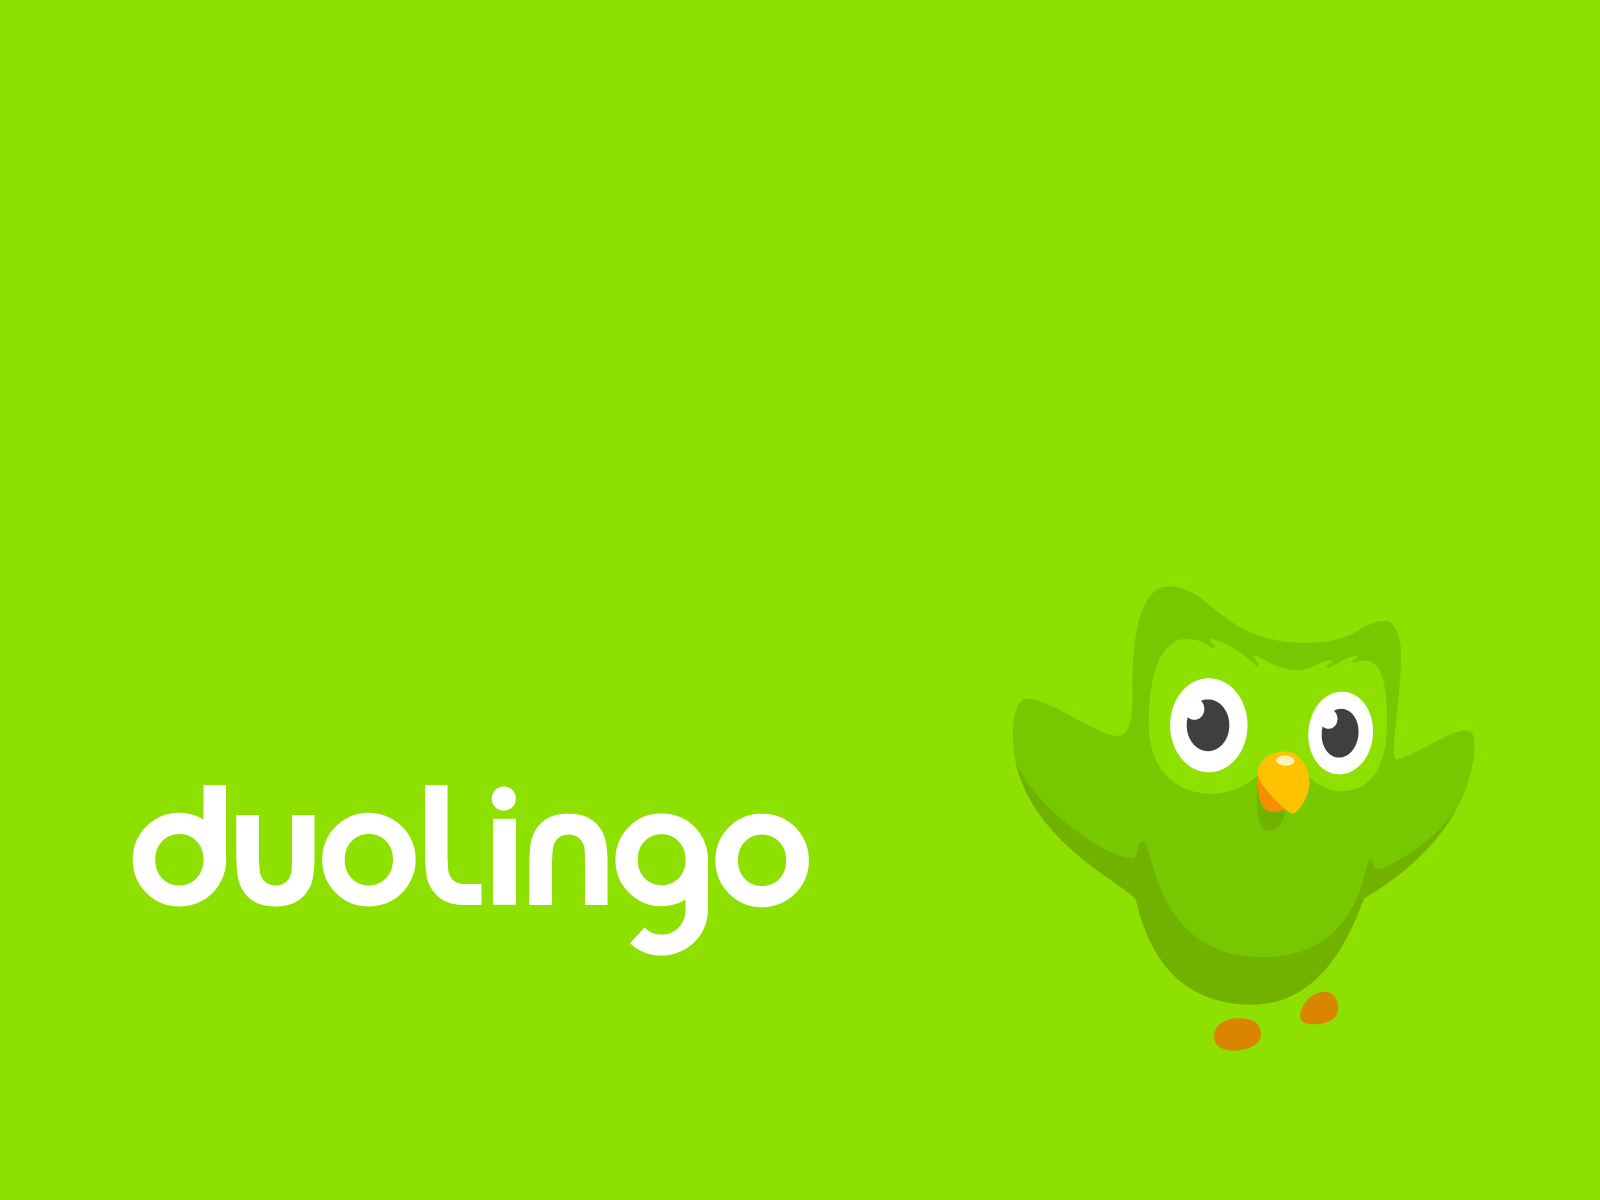 Duolingo Platform Belajar Bahasa Asing Mendapatkan Pendanaan 25 Juta Dolar